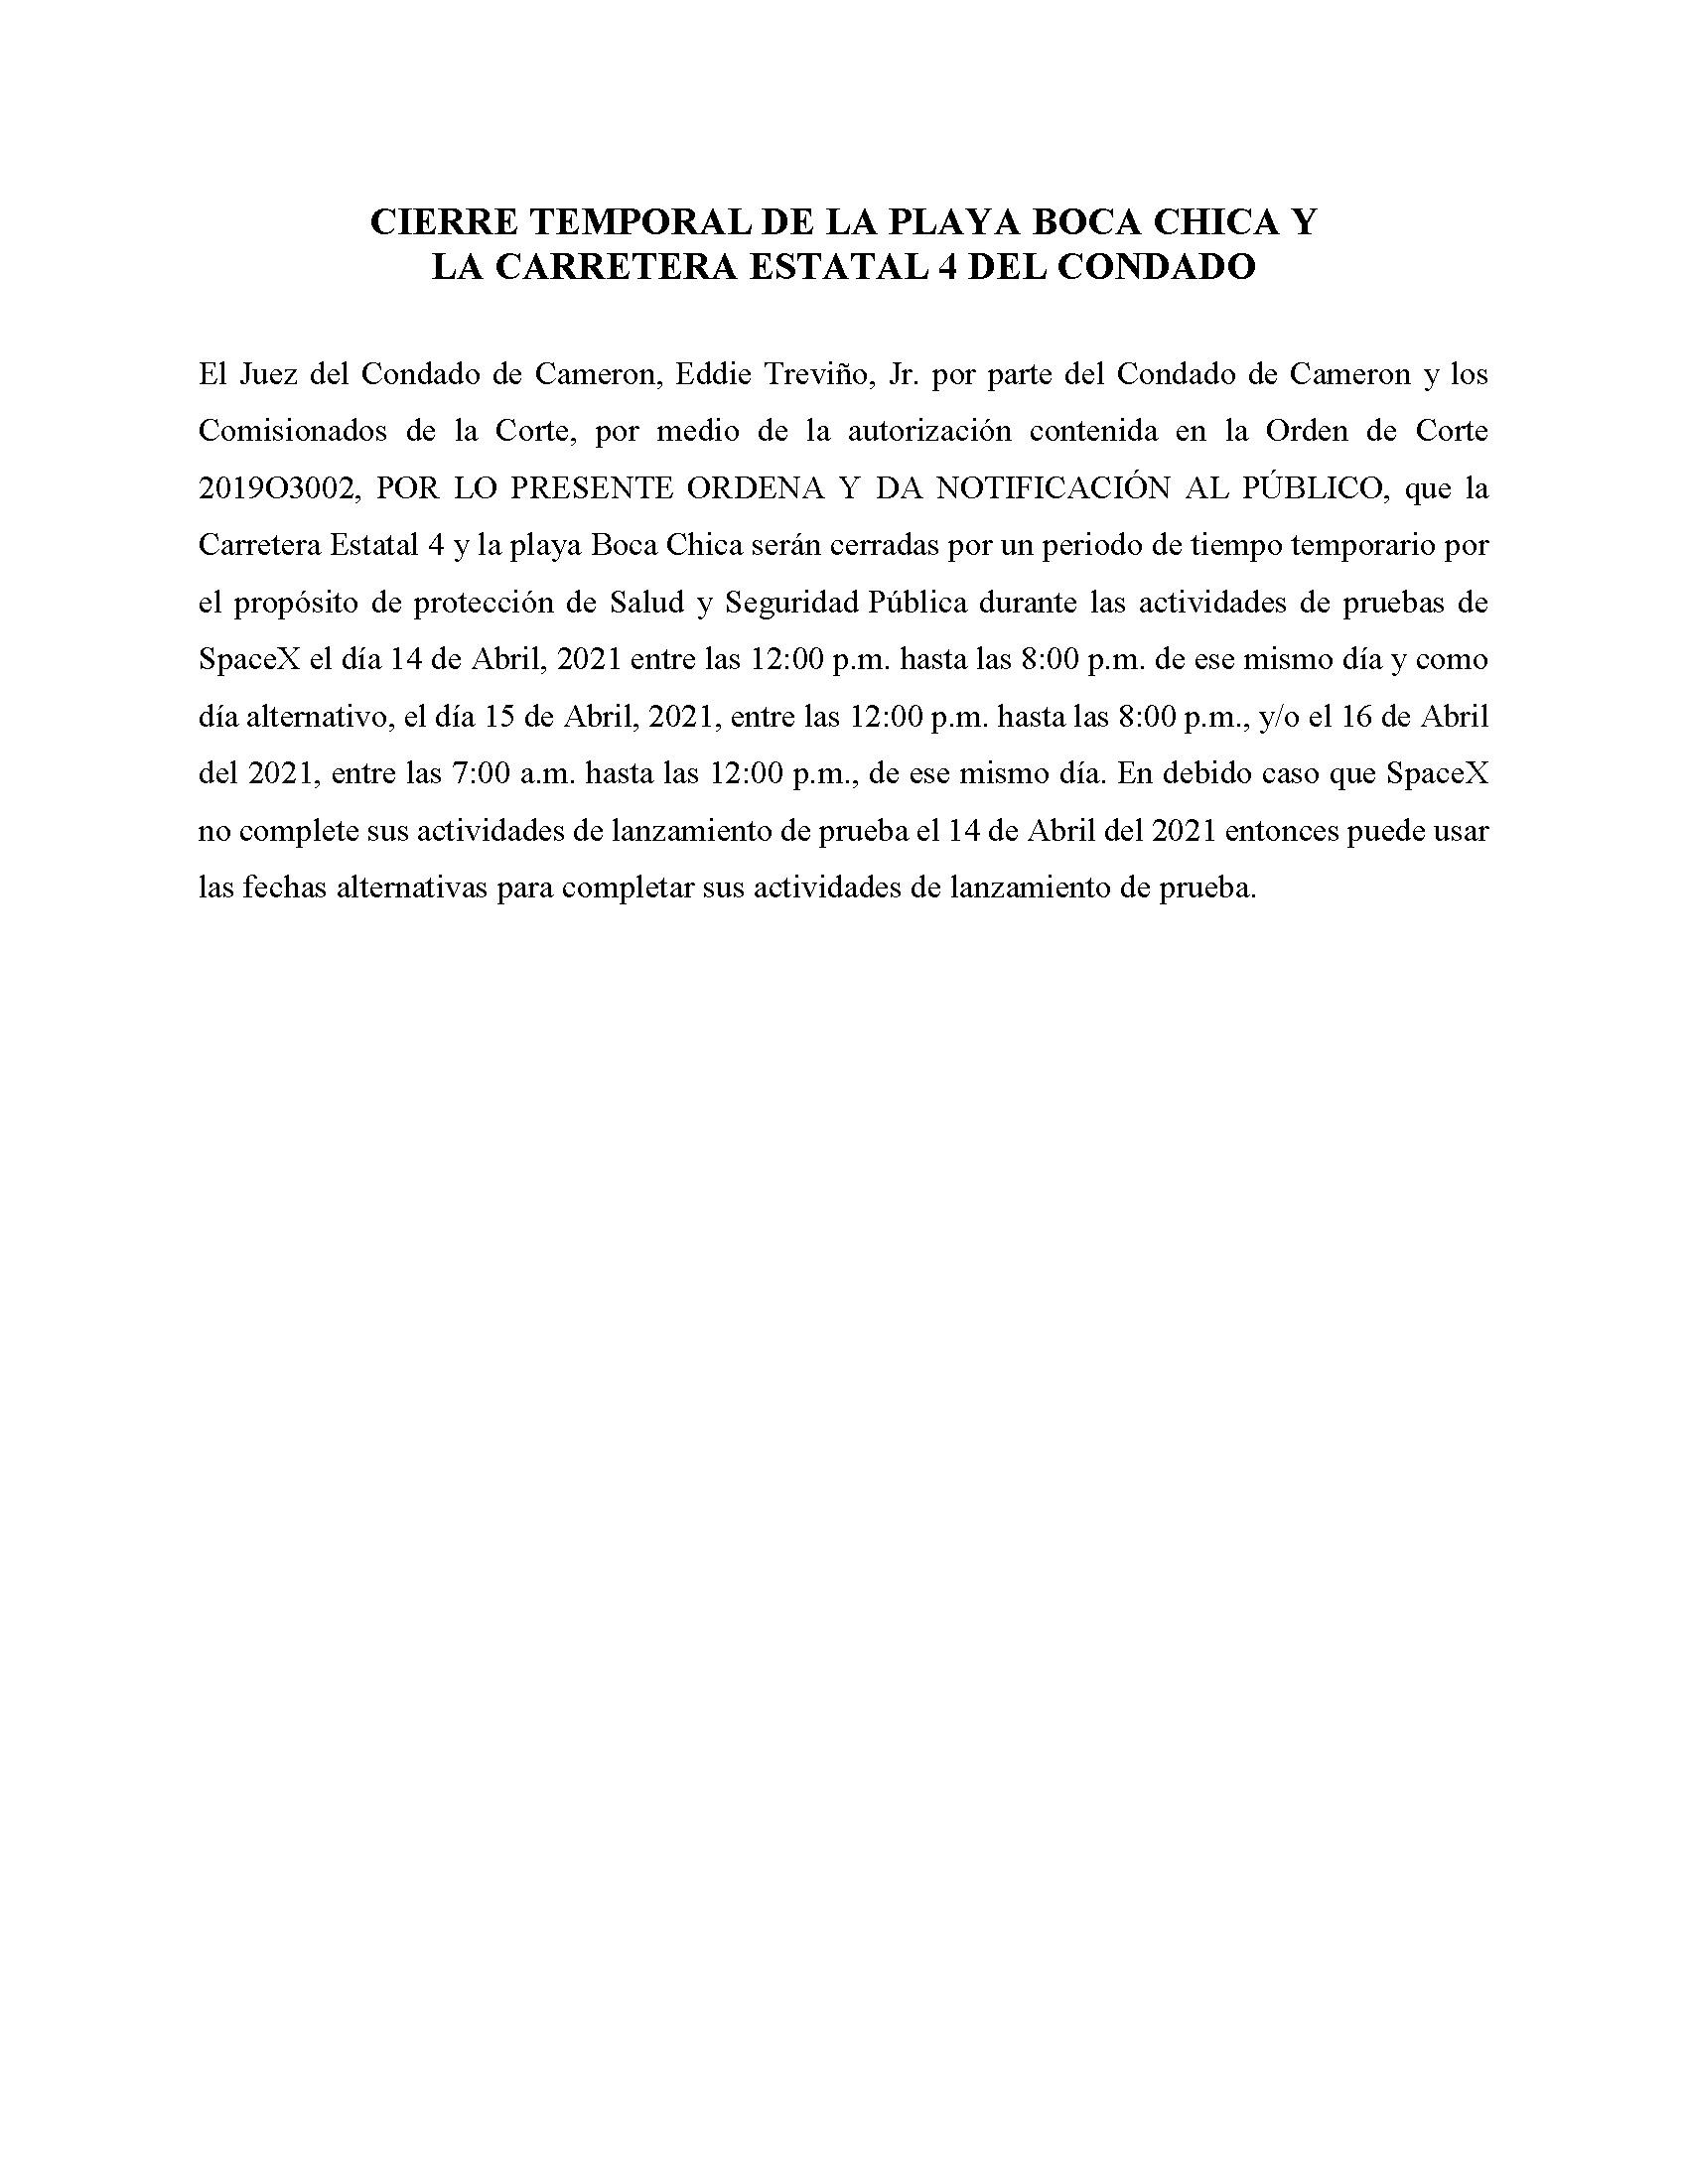 ORDER.CLOSURE OF HIGHWAY 4 Y LA PLAYA BOCA CHICA.SPANISH.04.14.2021